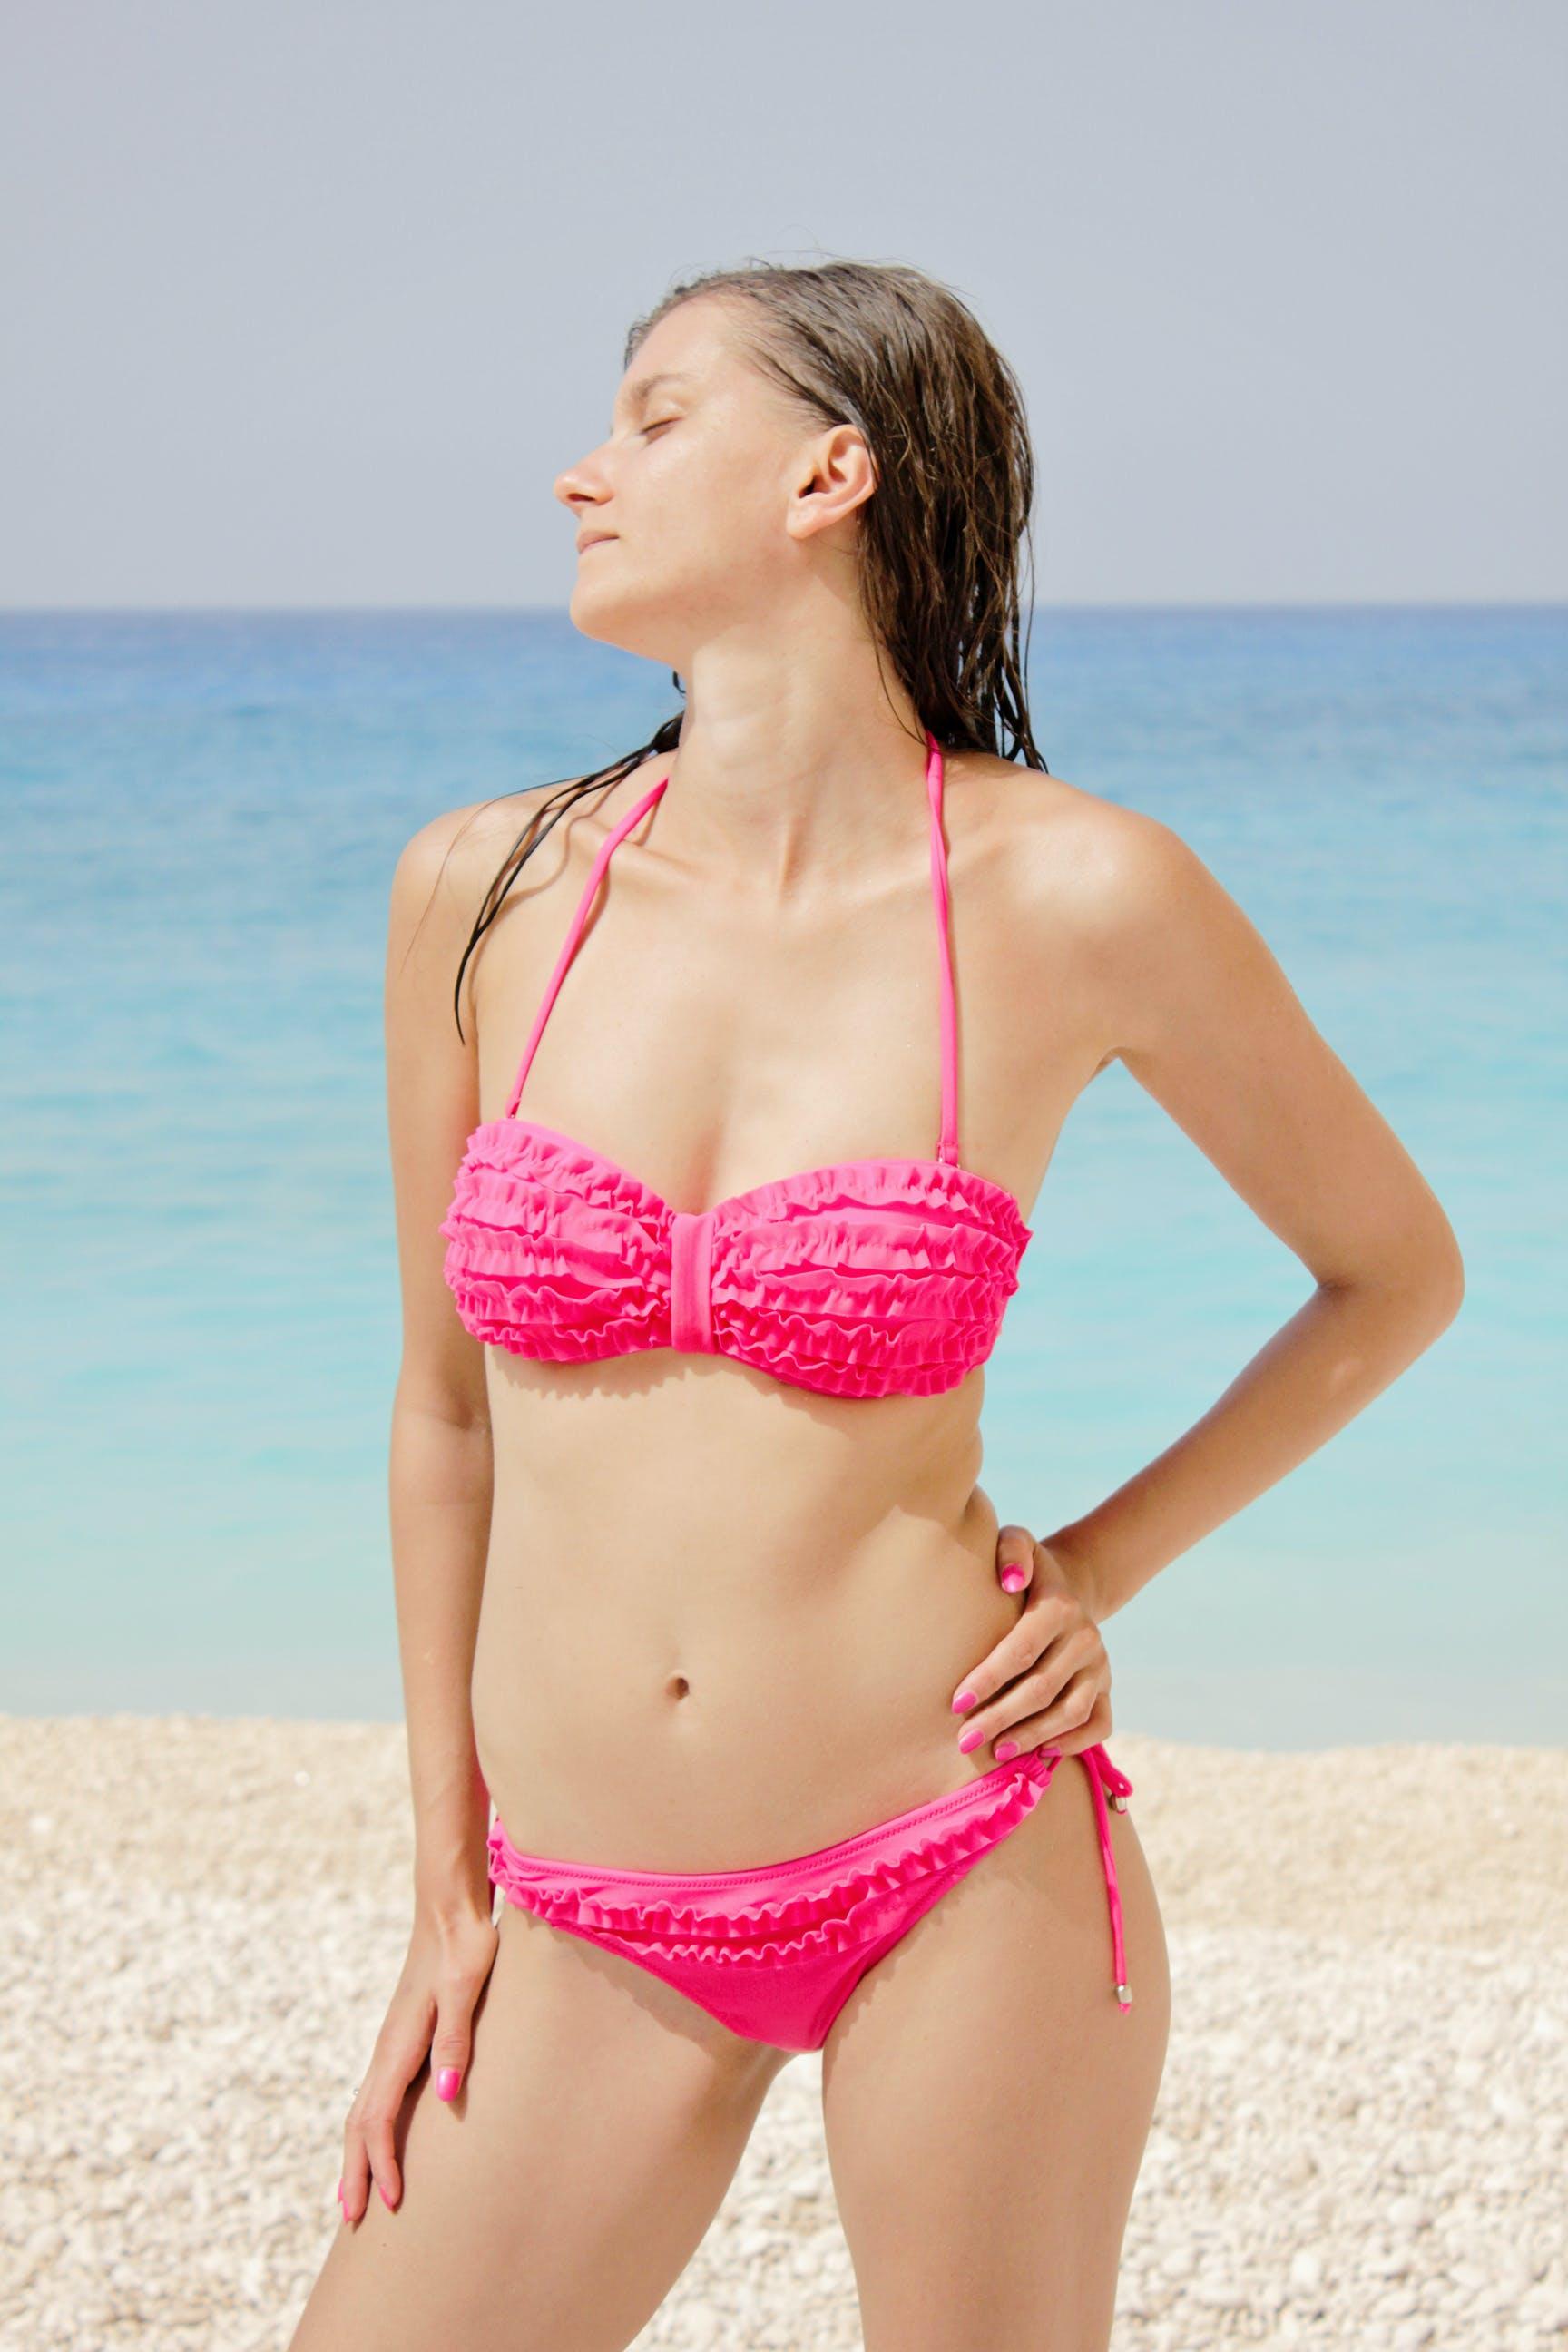 badeanzug, bikini, entspannung